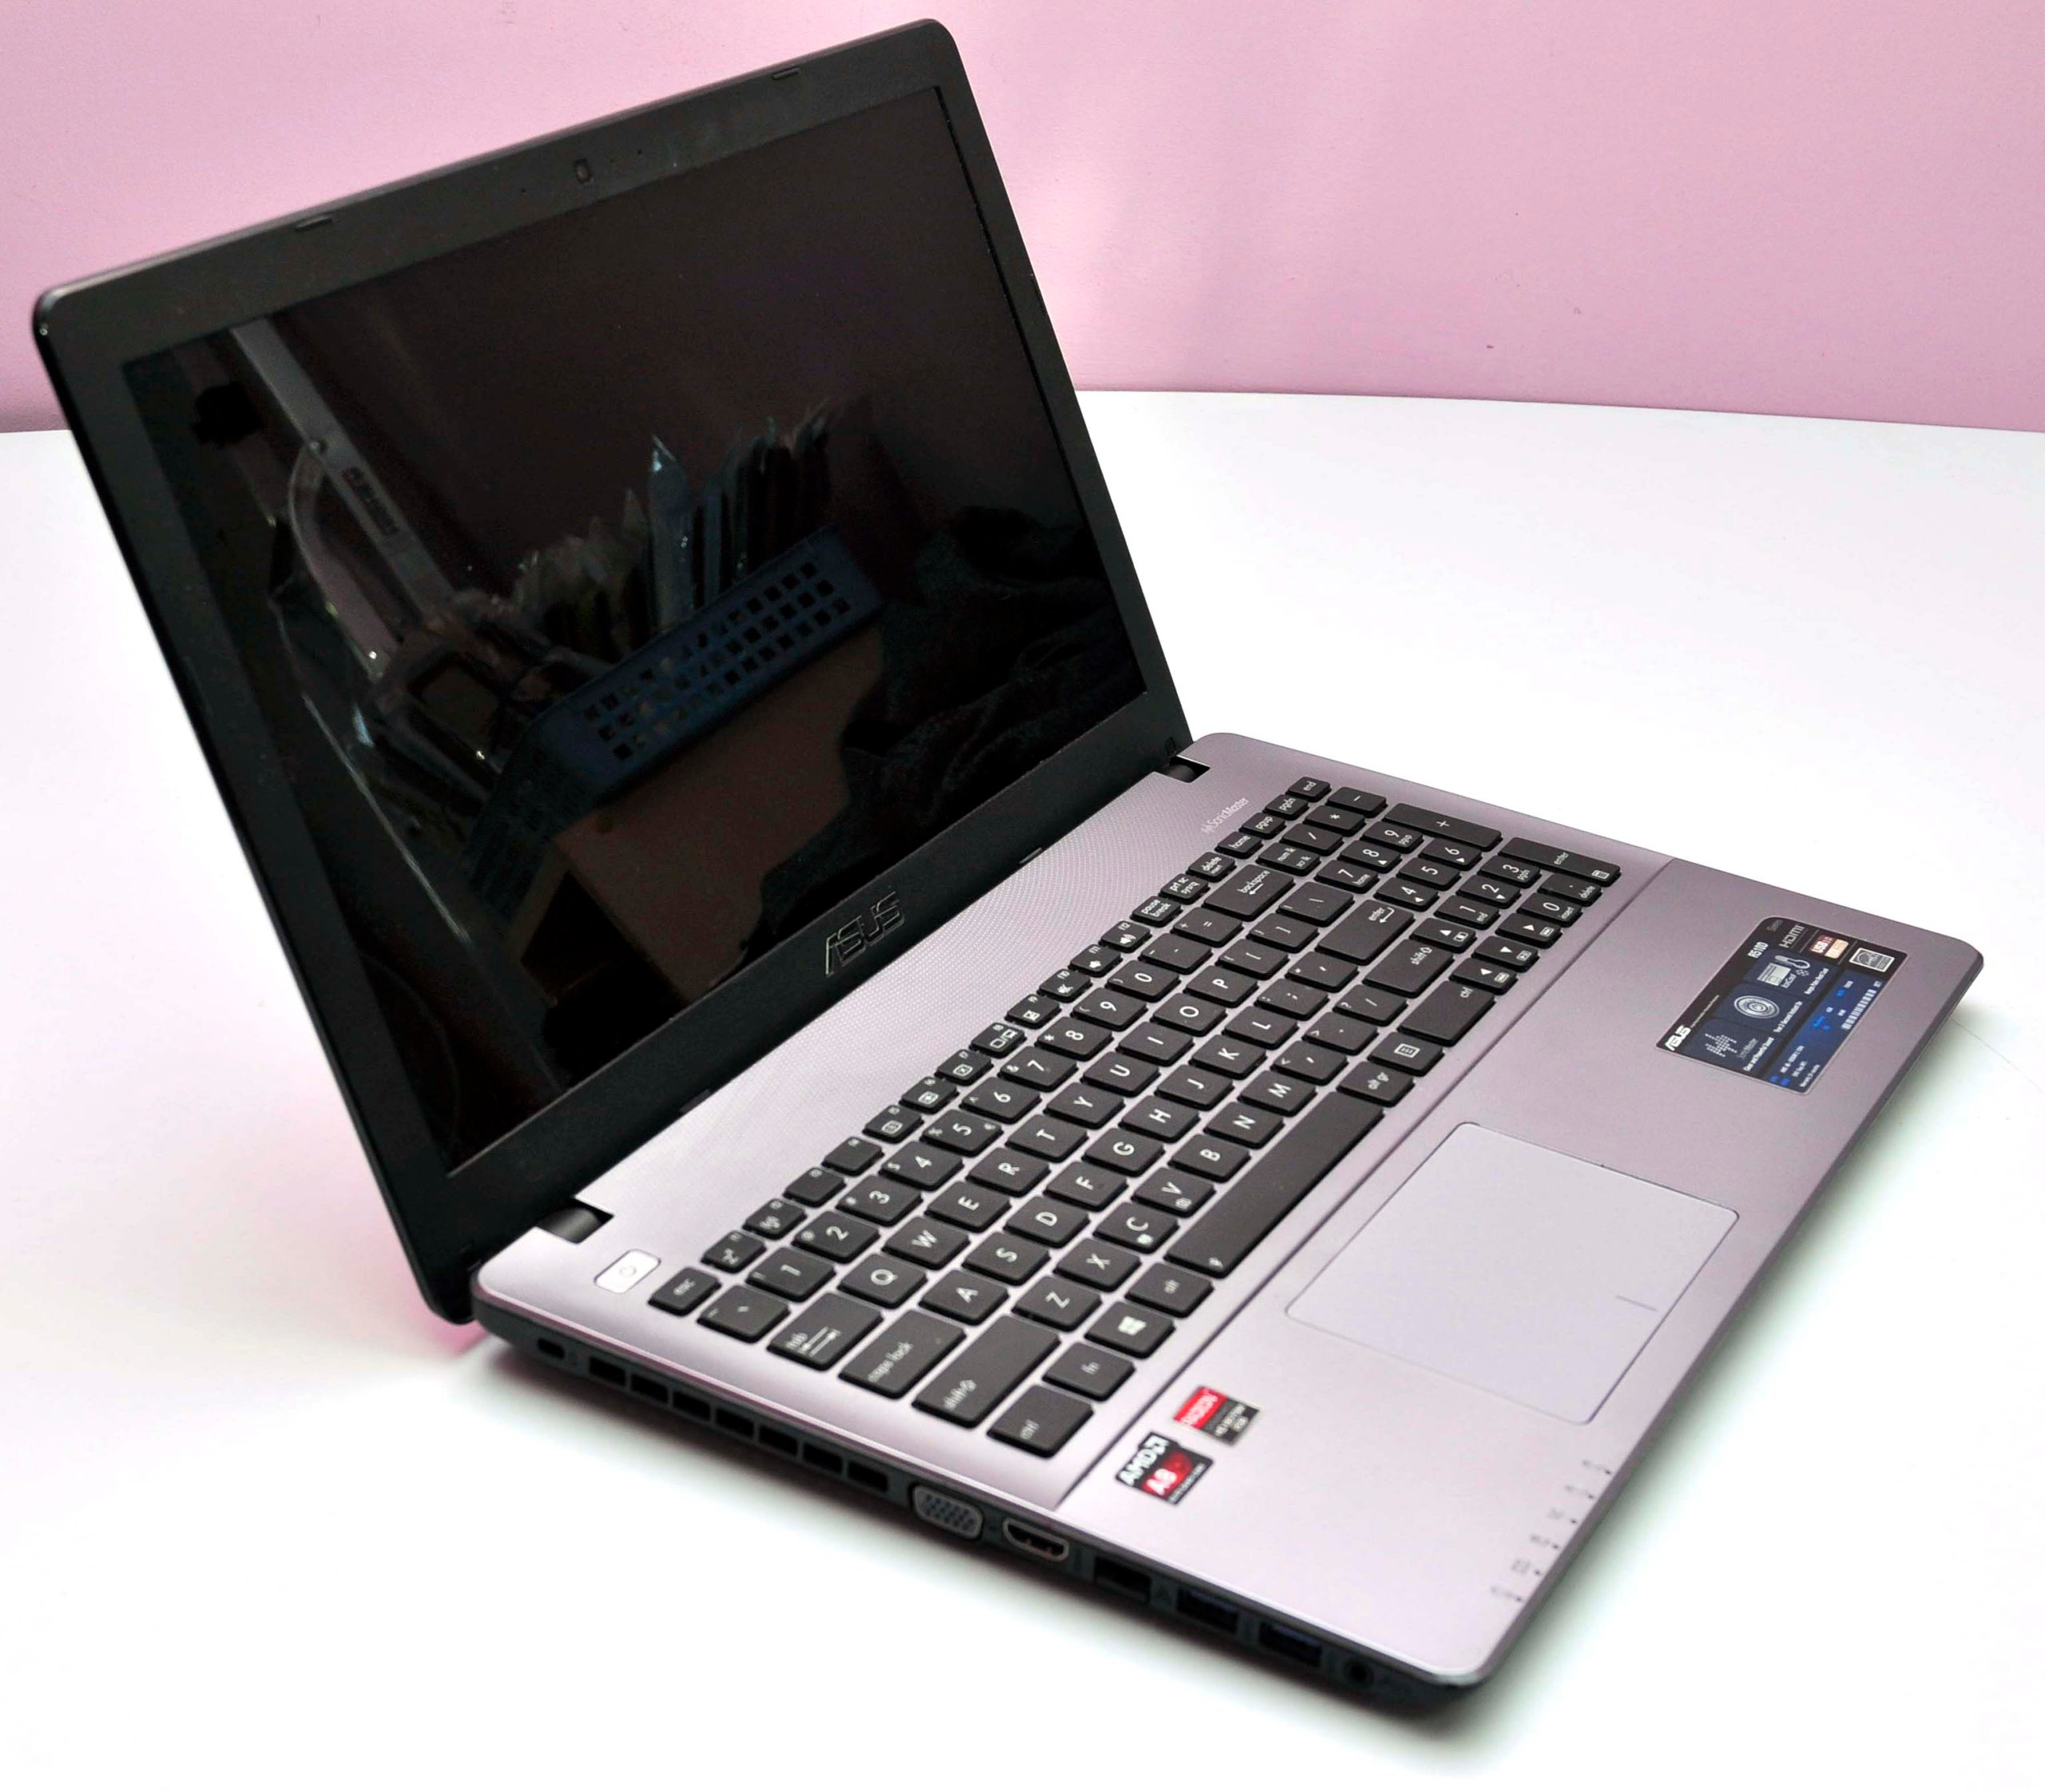 Laptop DO GIER ASUS R510D AMD A8 5550M 7226569624